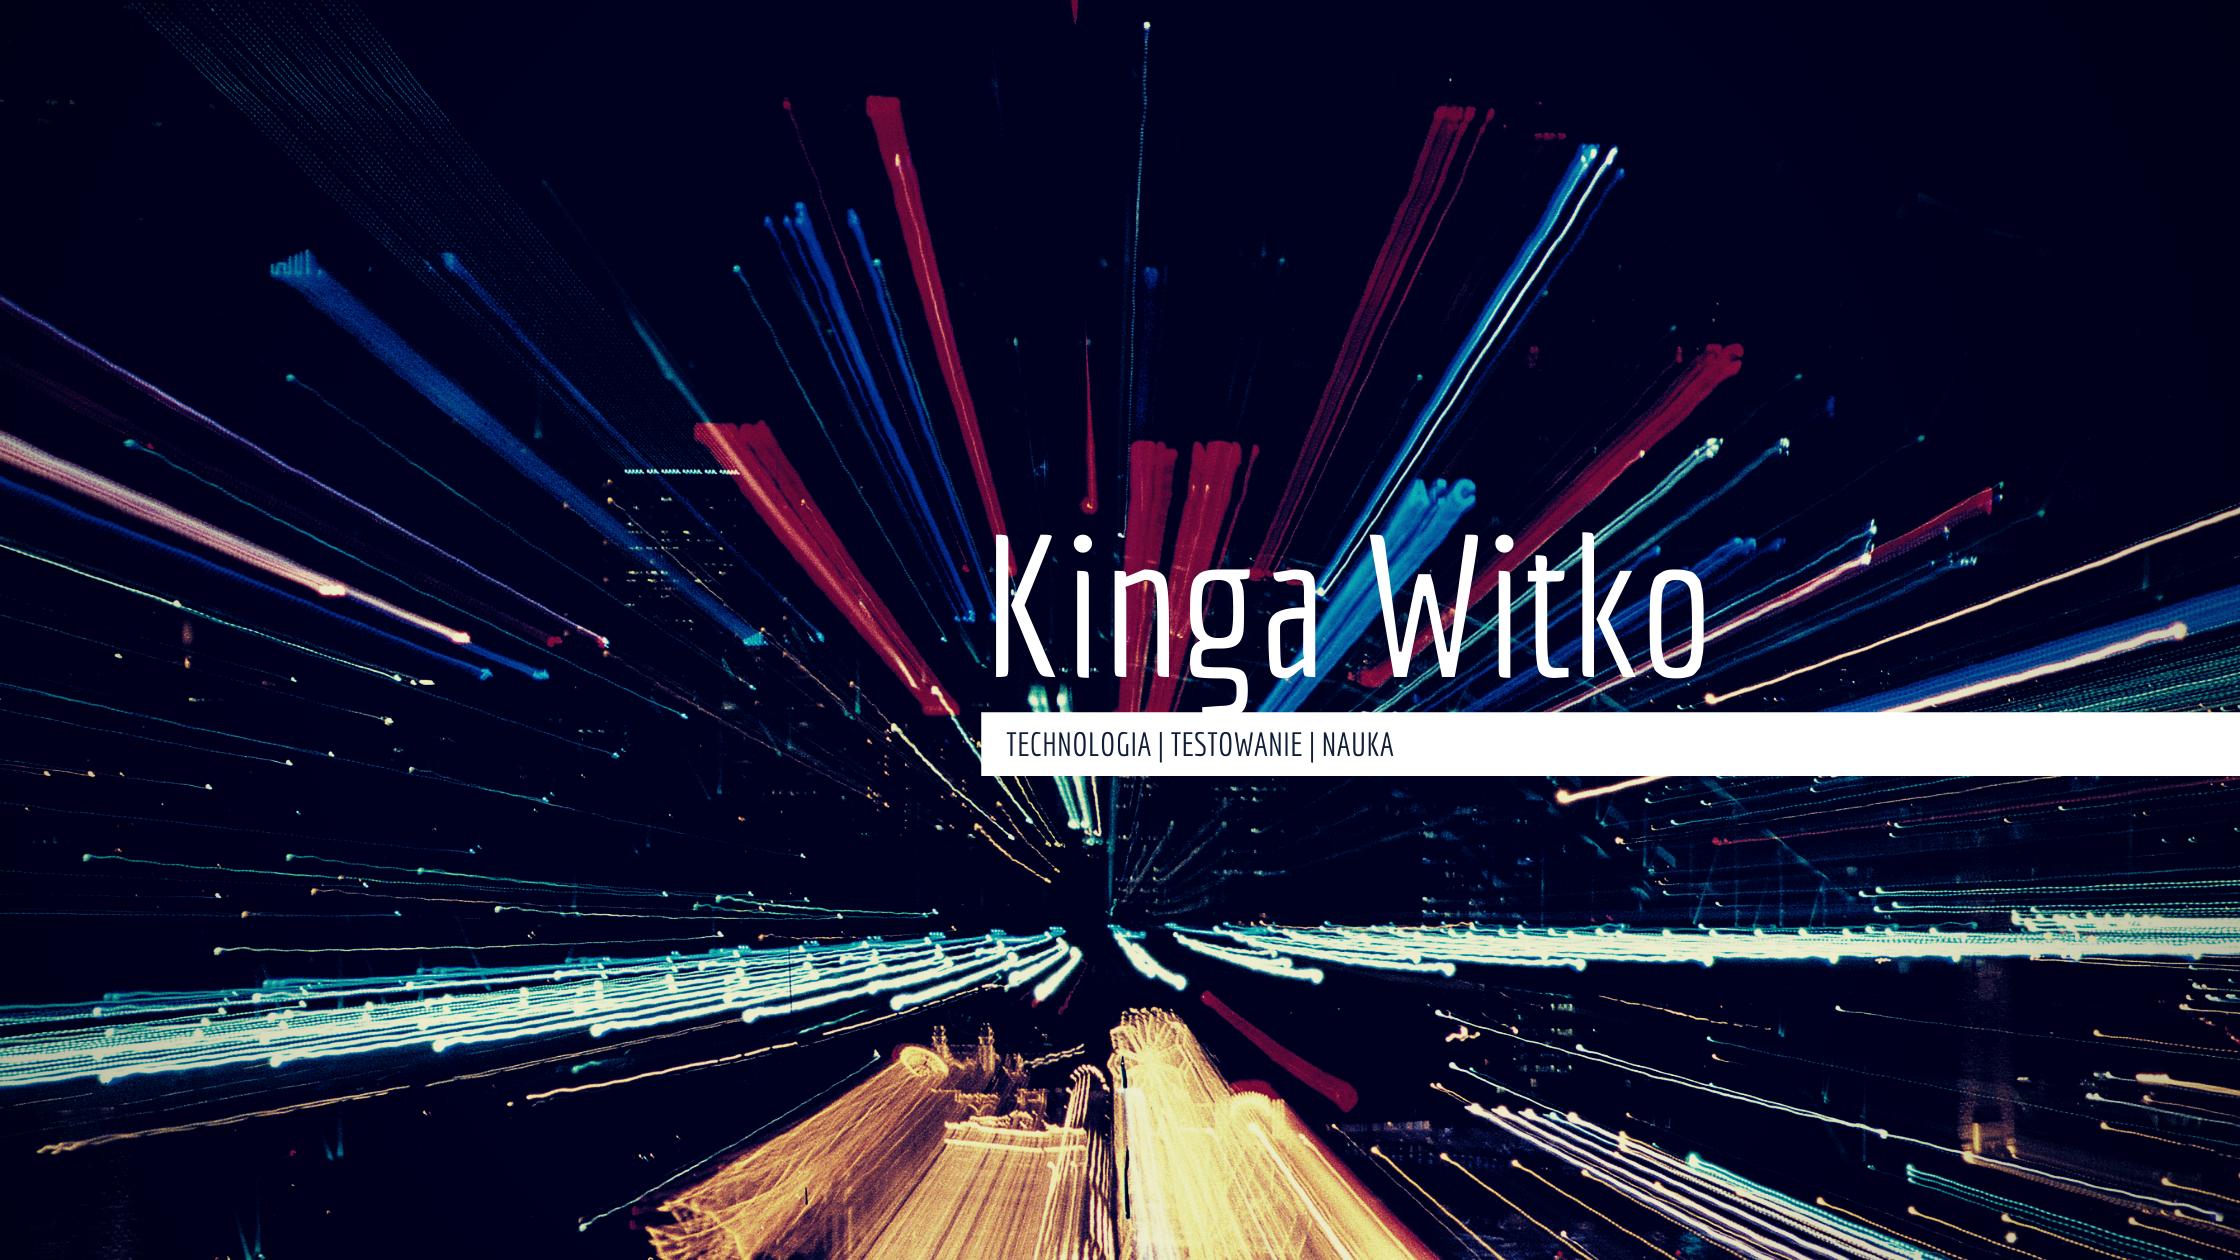 Kinga Witko